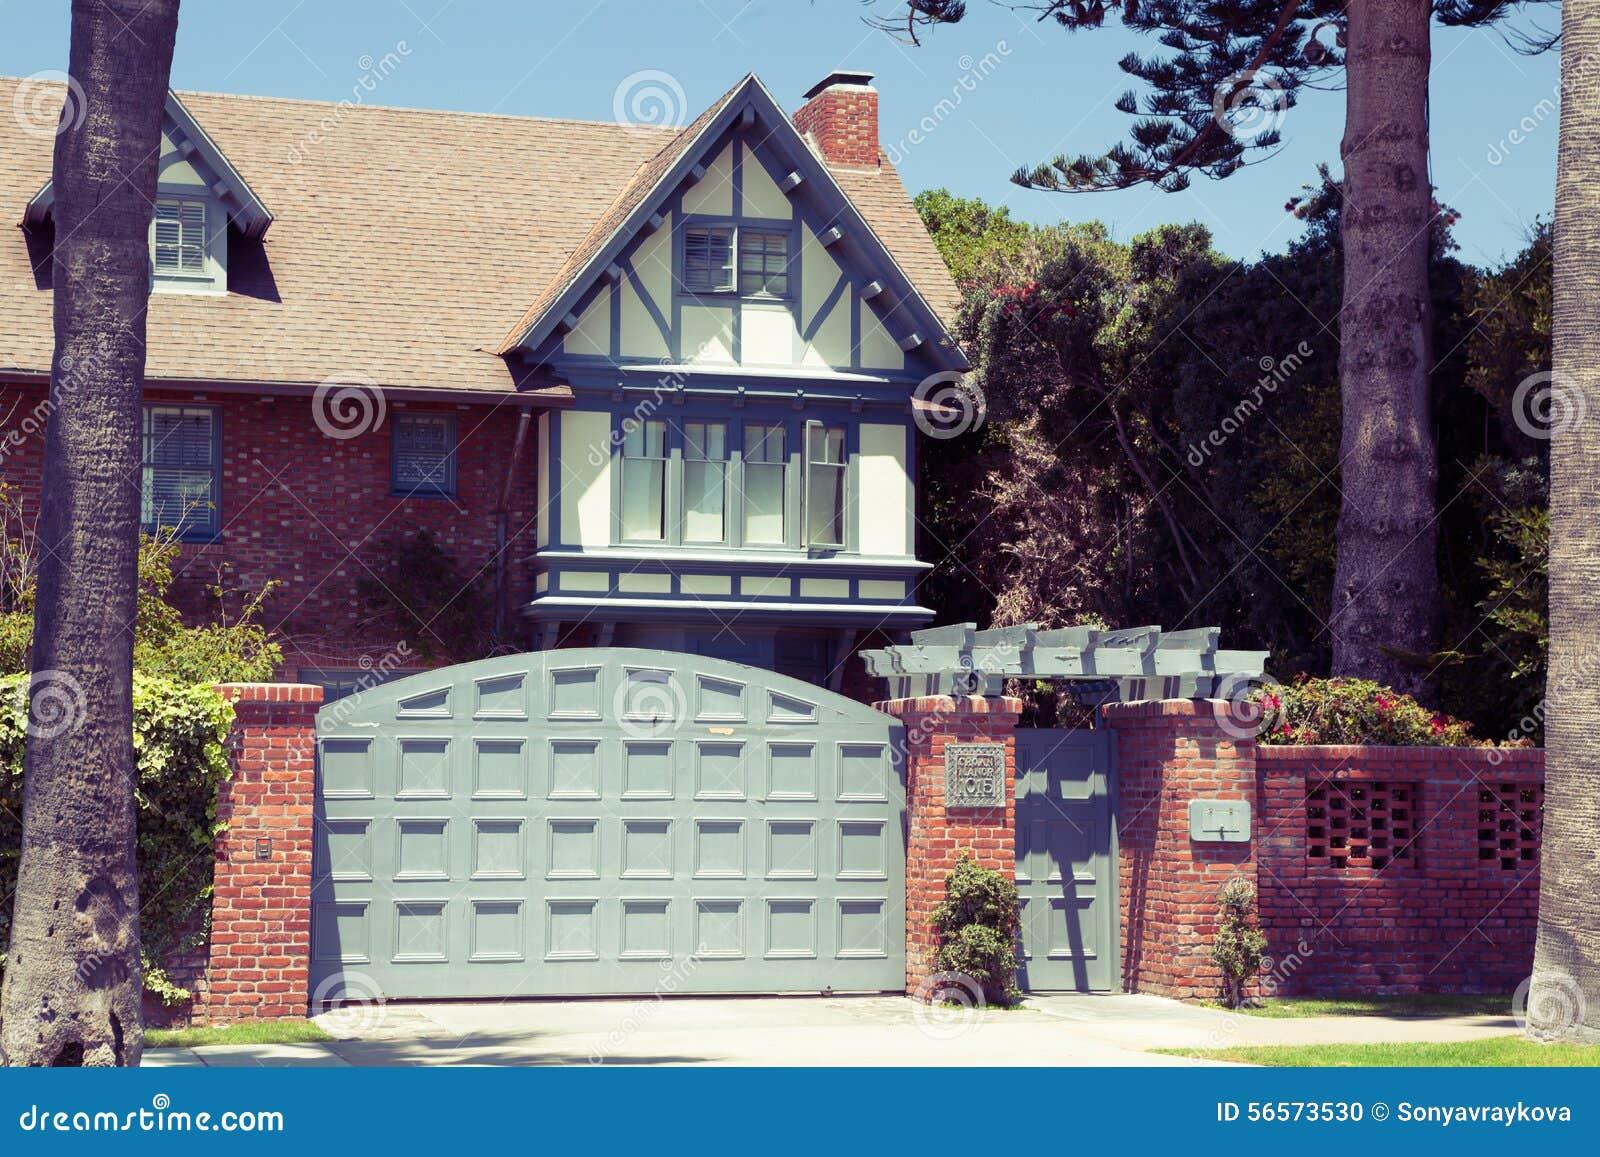 Download Σπίτι εξοχικών σπιτιών - Coronado, Σαν Ντιέγκο ΗΠΑ Στοκ Εικόνες - εικόνα από είσοδος, ύφος: 56573530